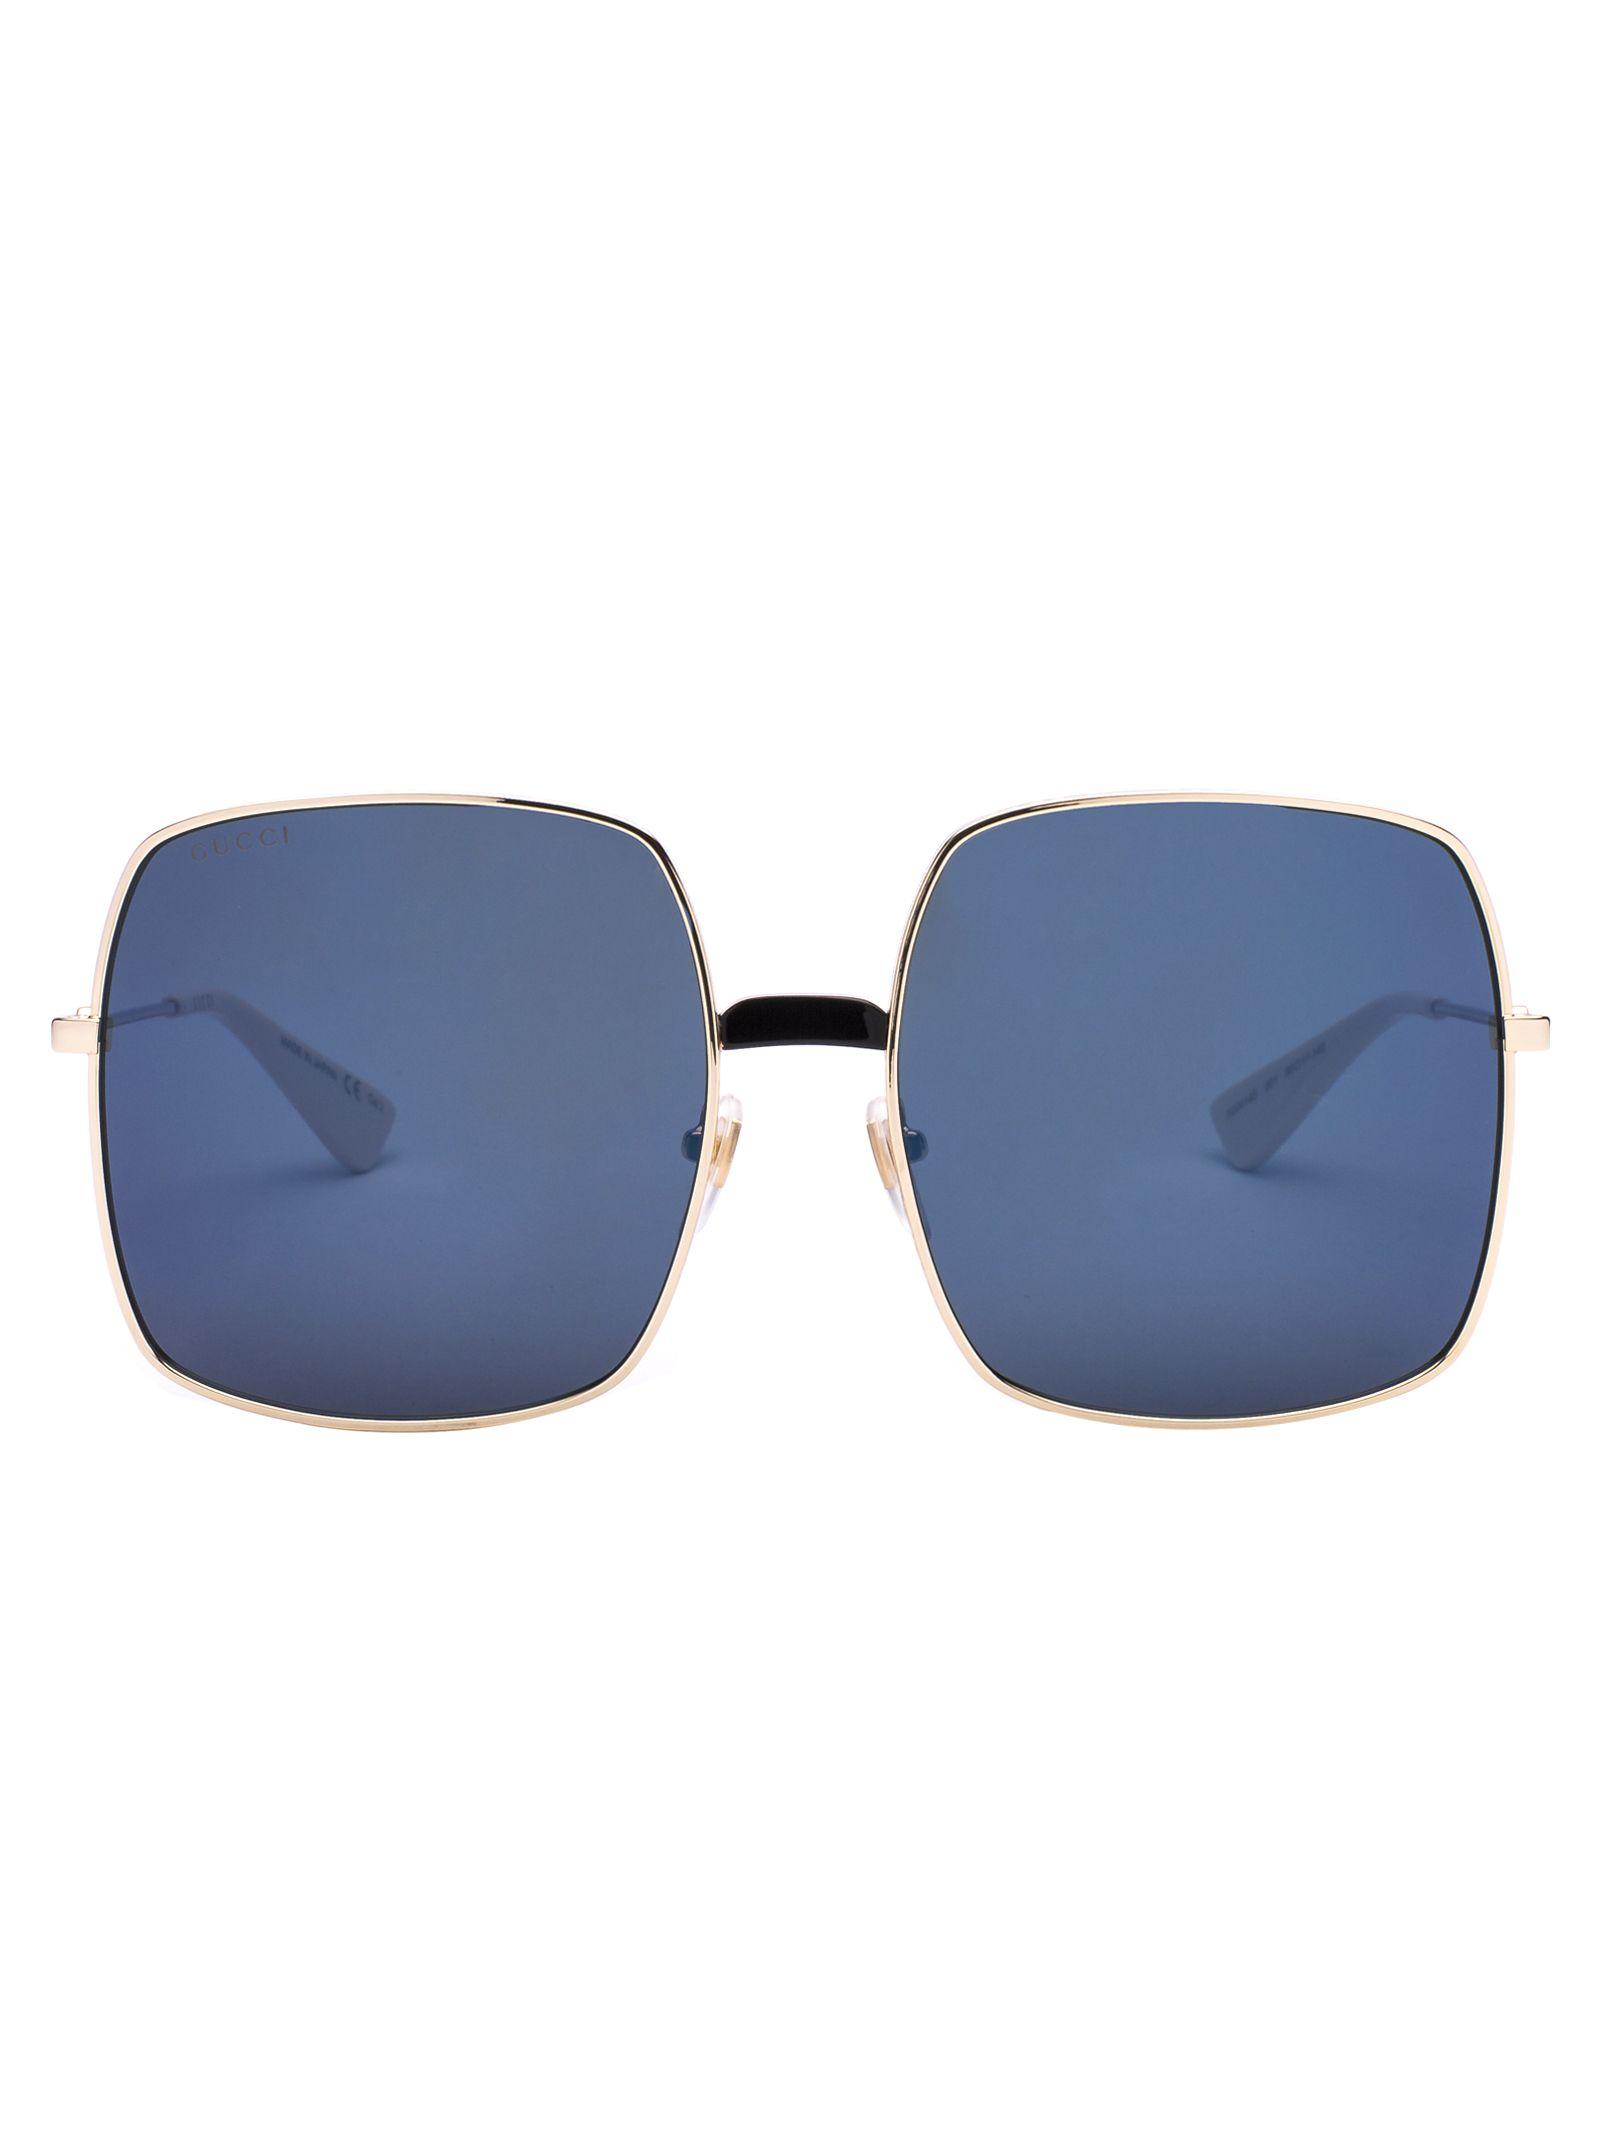 Gucci Eyewear Oversized Frame Sunglasses